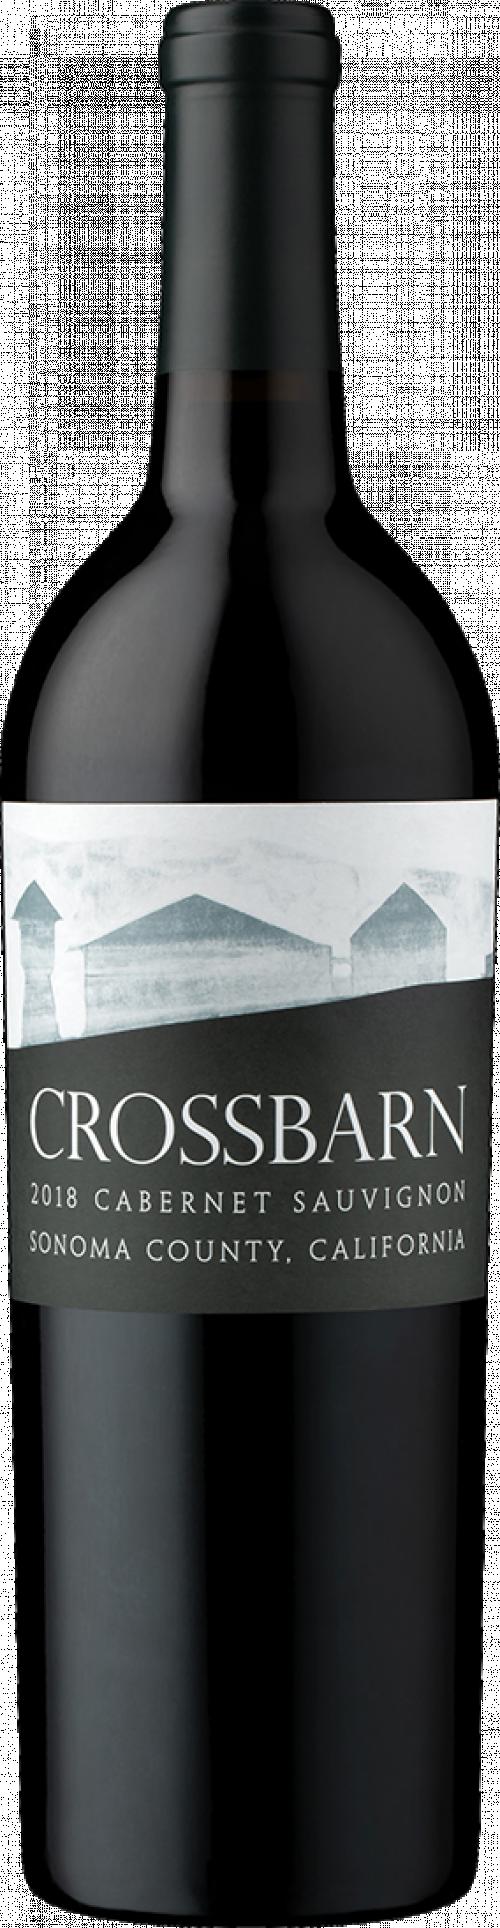 2018 Crossbarn Cabernet Sauvignon by Paul Hobbs 750ml